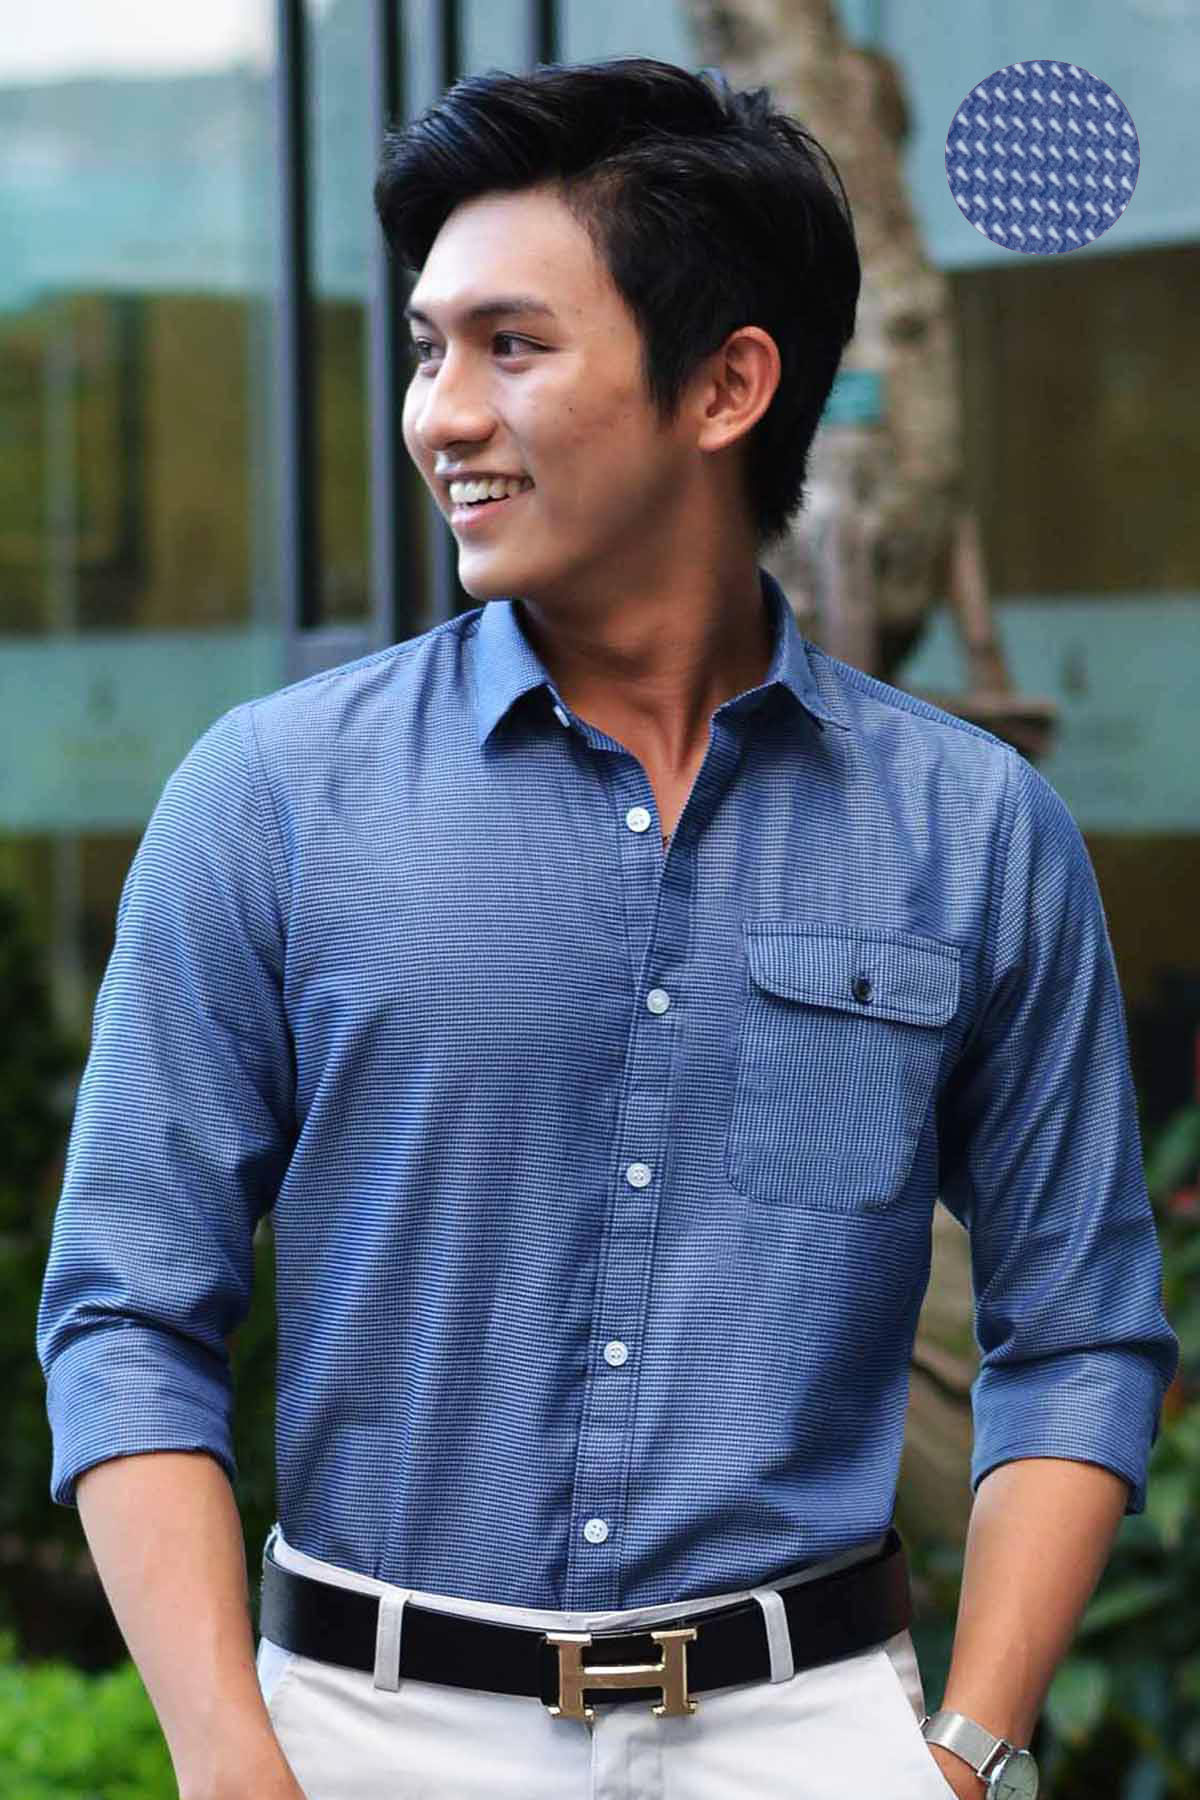 Premium Rippled Dark Blue Shirt with Pocket